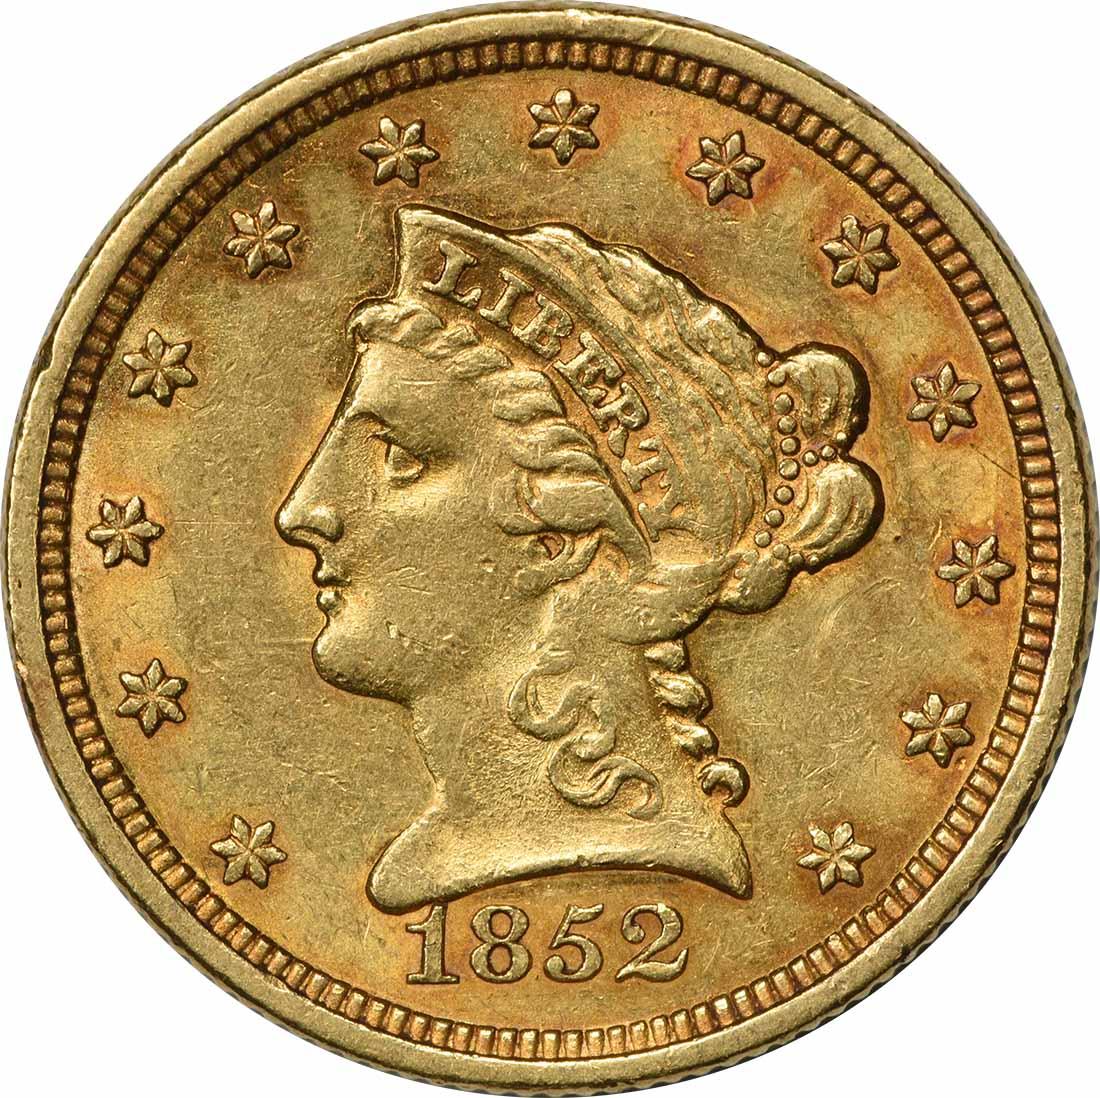 1852 $2.50 Gold Liberty Head AU58 Uncertified